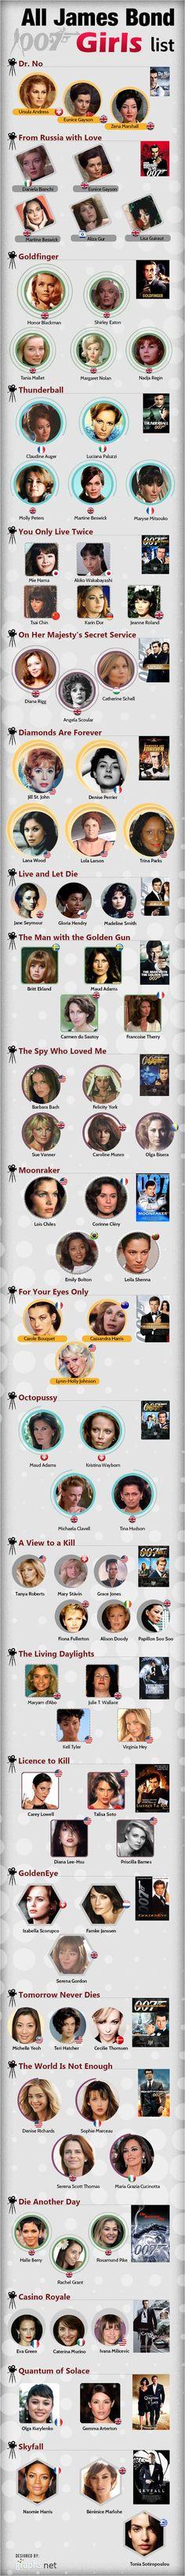 All James Bond Girls List Infographic James Bond Party, James Bond Movies, James Bond Characters, James Bond Theme, Estilo James Bond, Timothy Dalton, Bond Cars, Cinema Tv, Ursula Andress